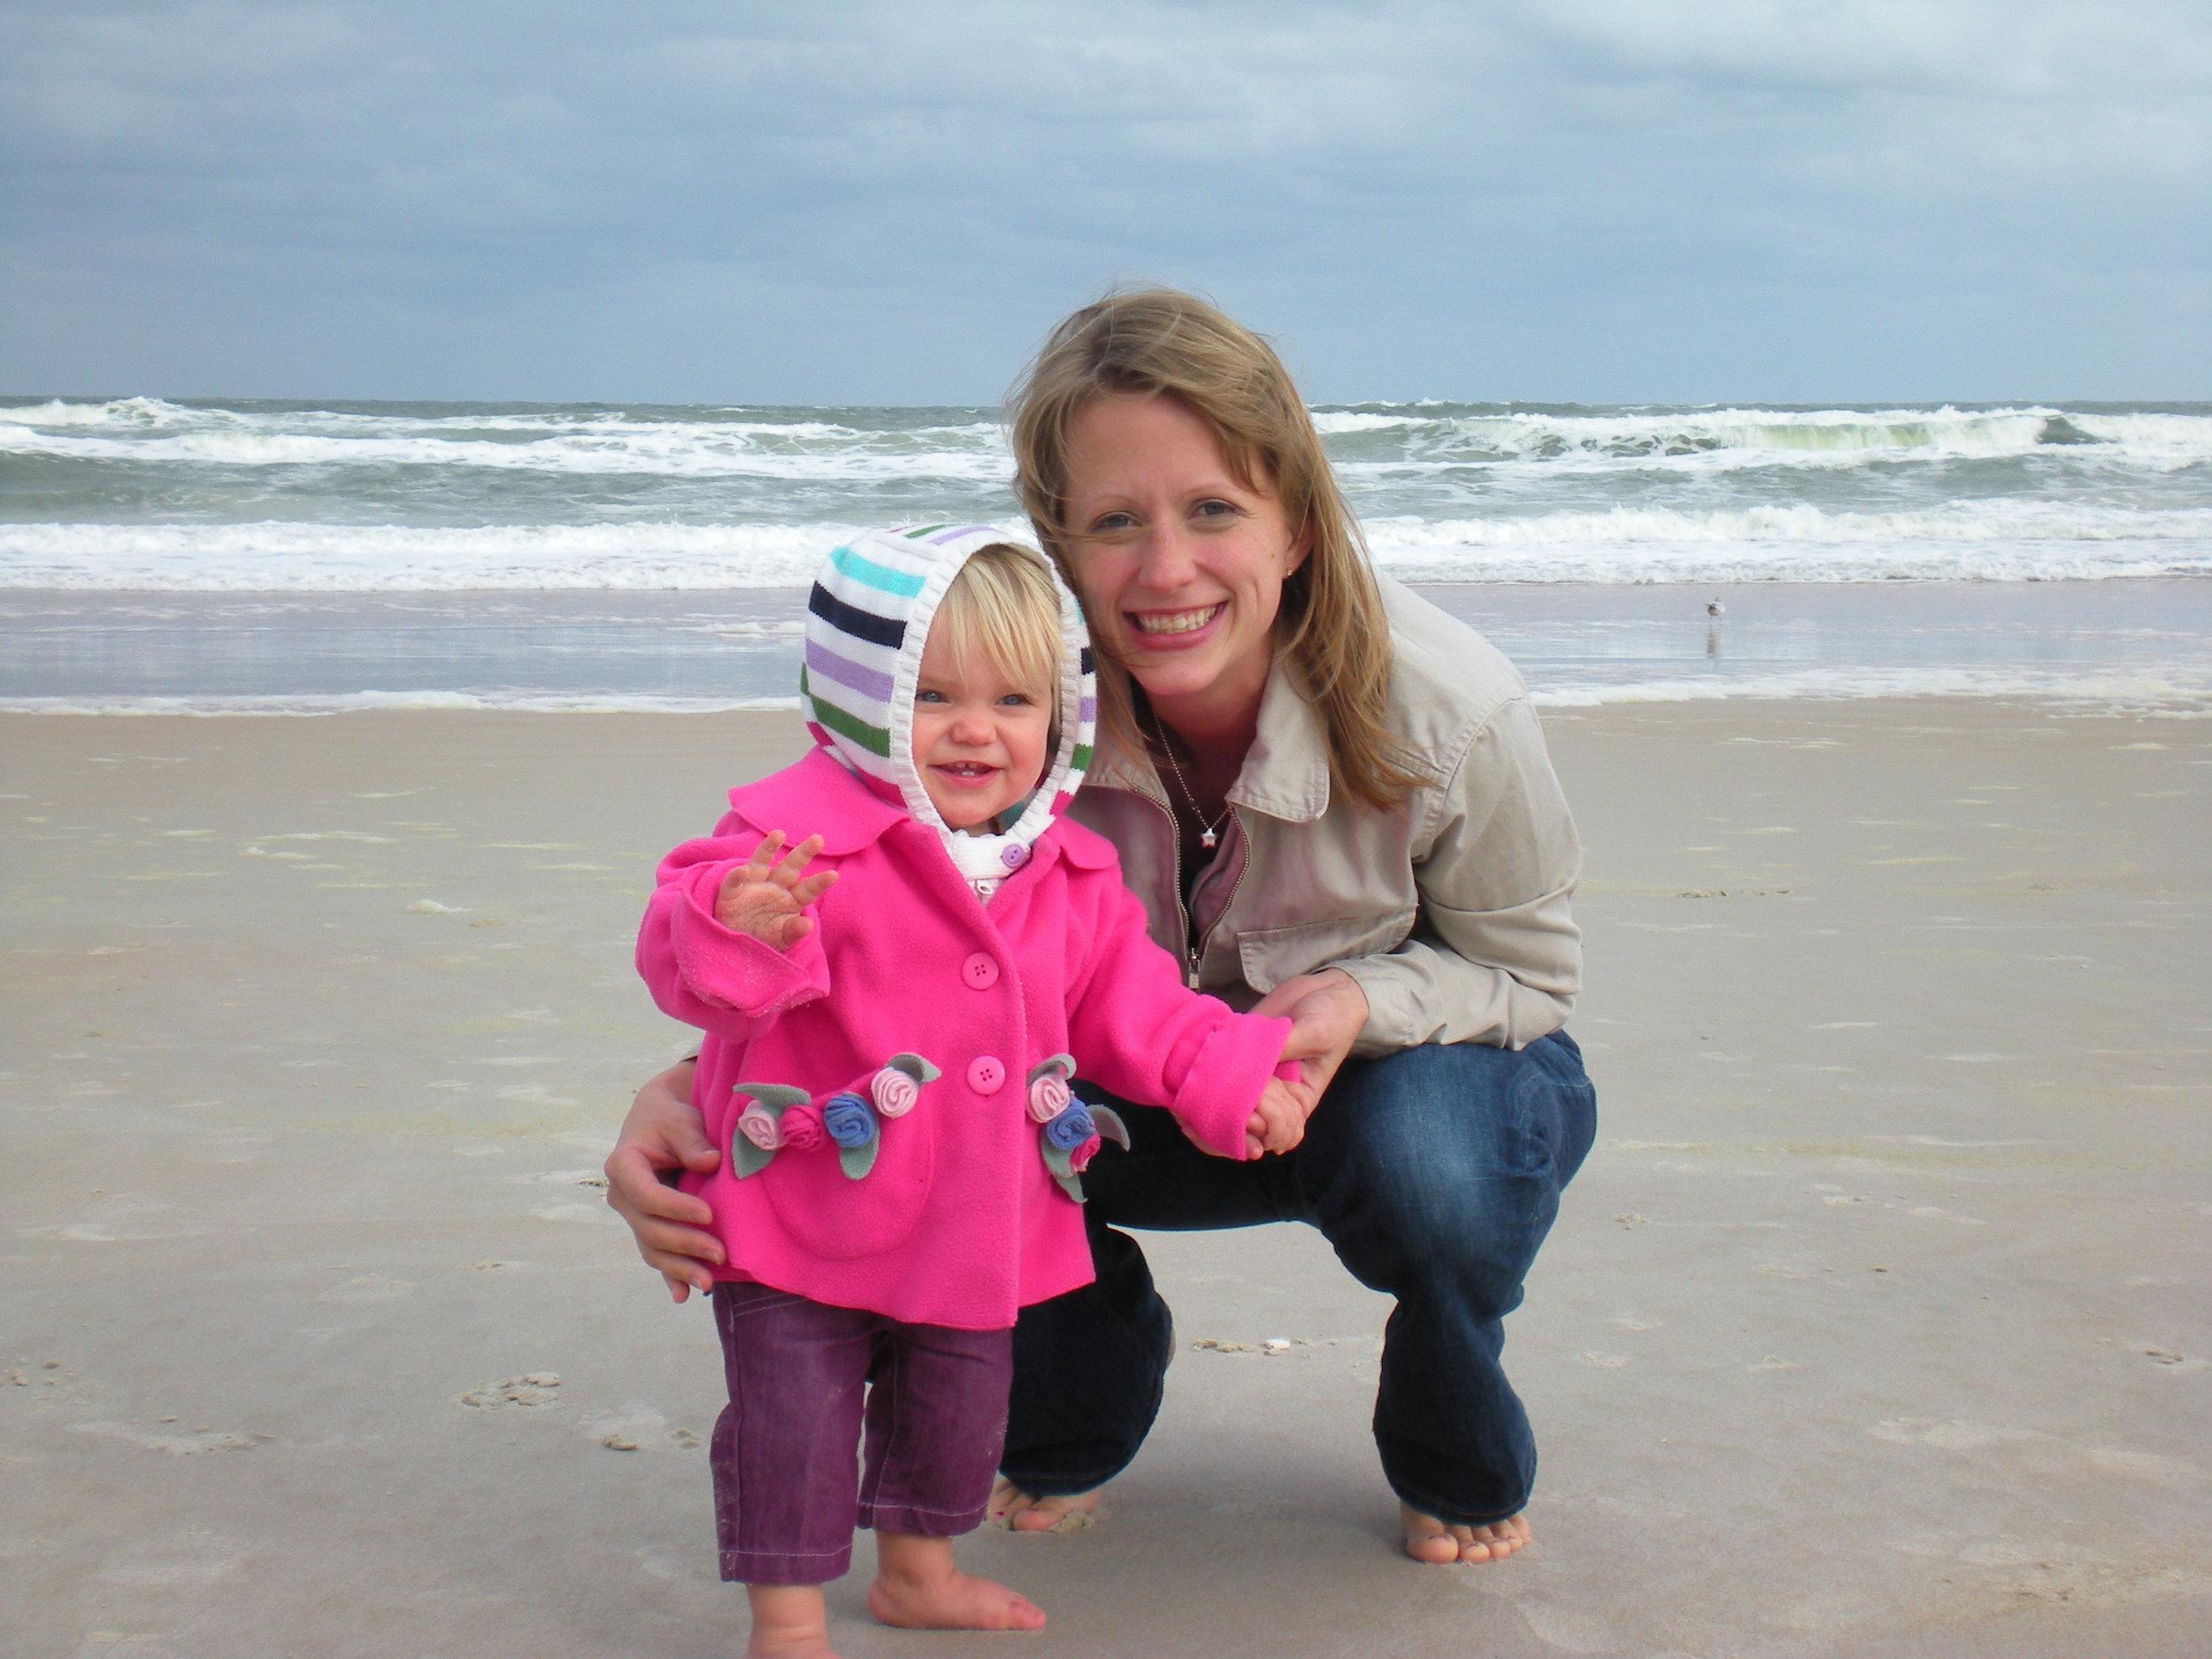 Alyssa's 1st steps on a Florida beach